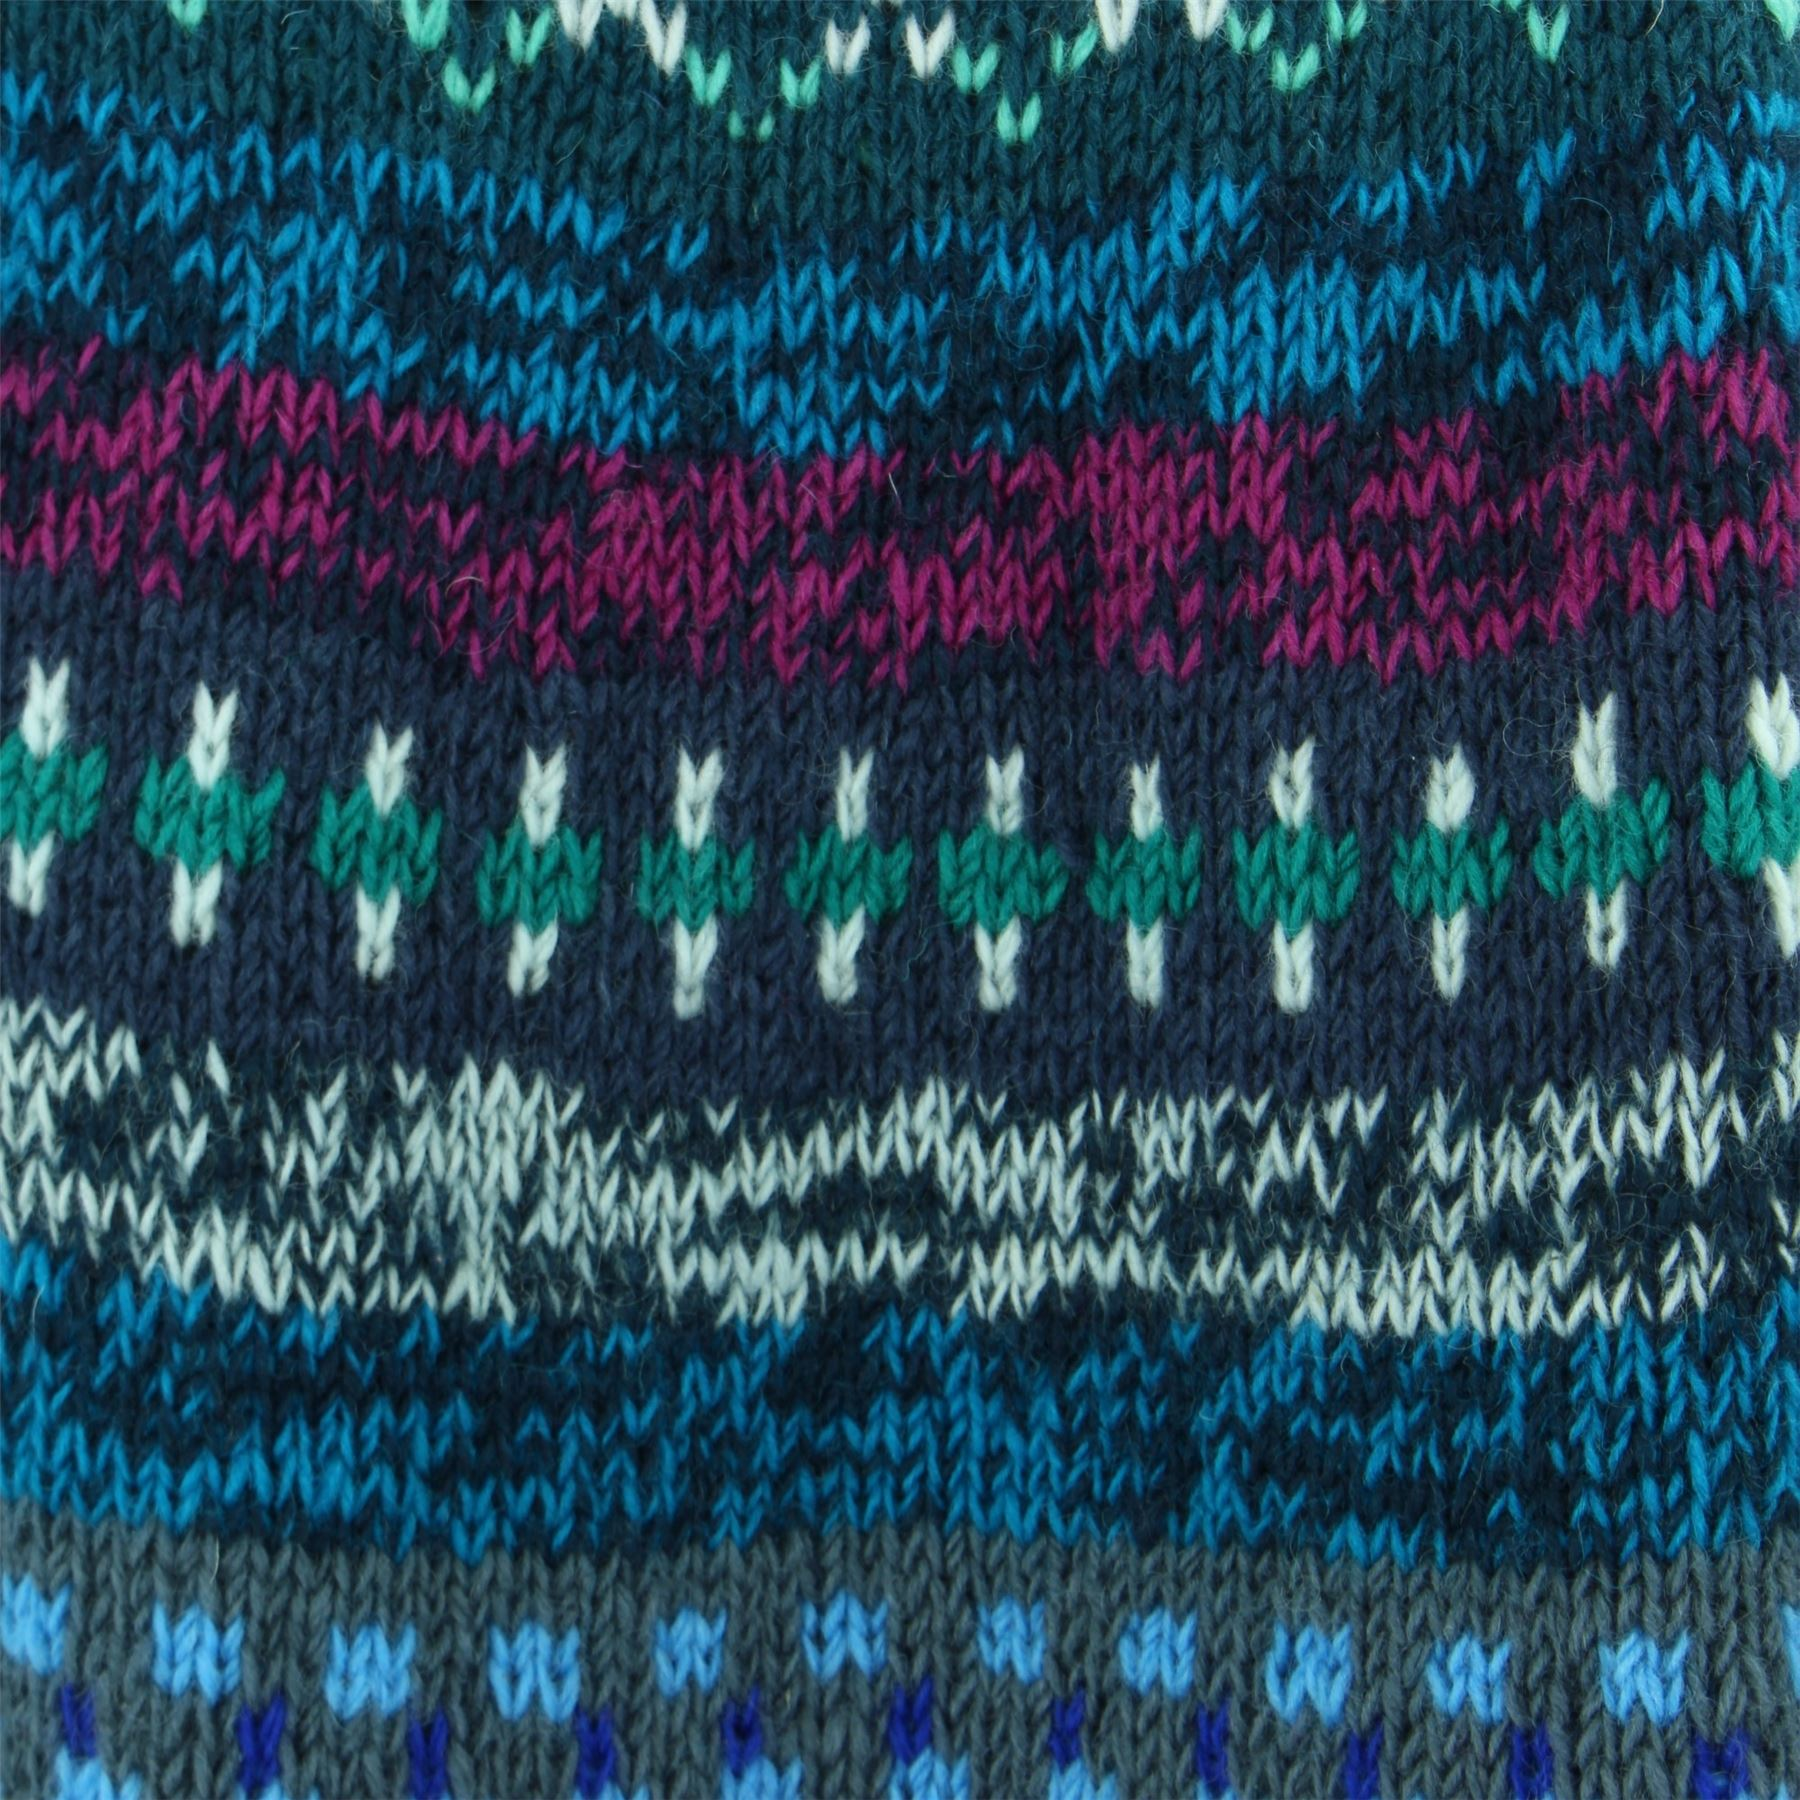 thumbnail 5 - Wool Knit Jumper Sweater Pullover Fairisle Nordic Abstract Warm Nepal Loose